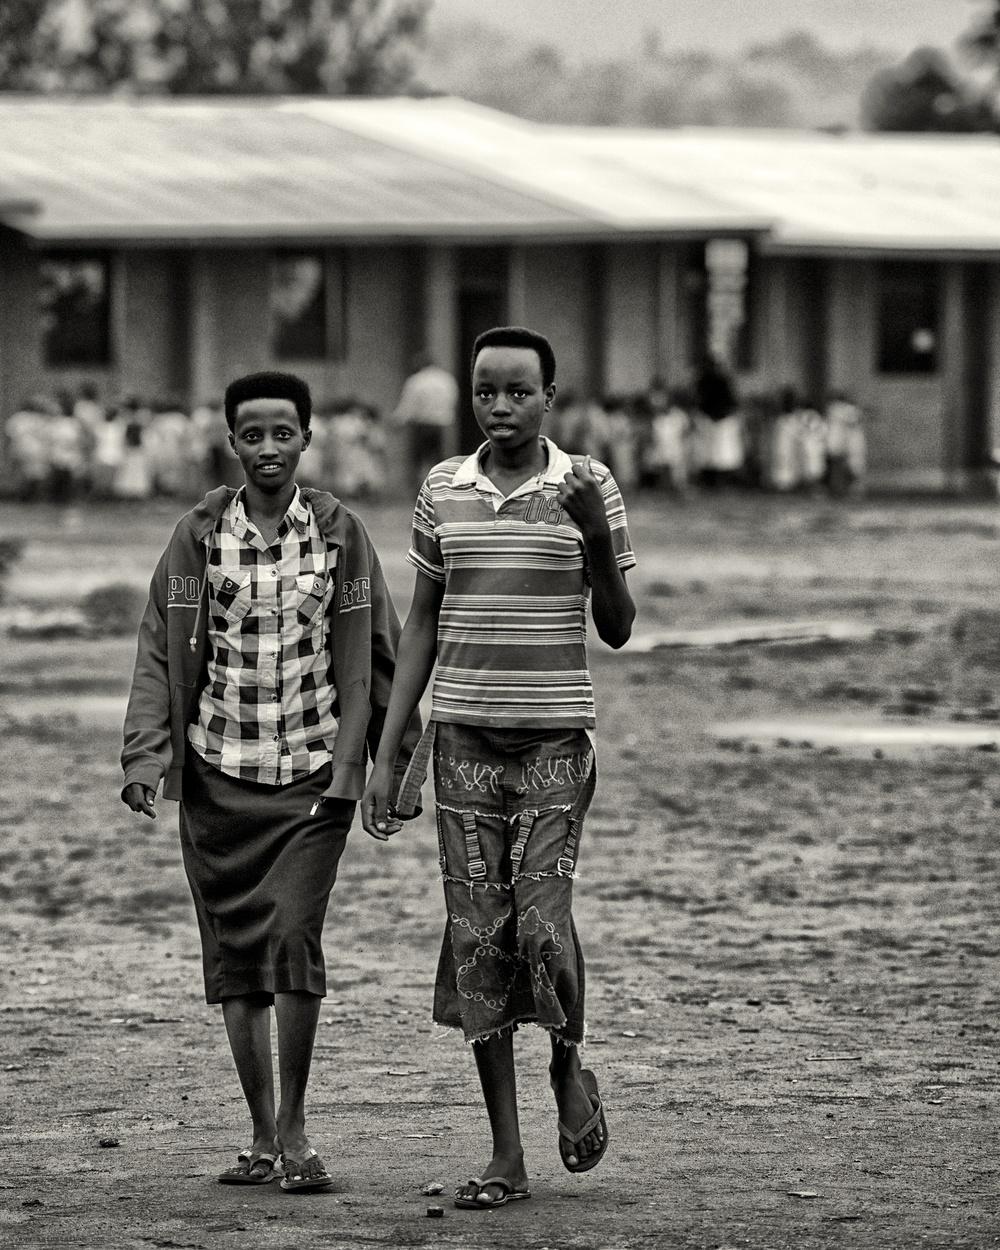 burundi bw feb 14 6.jpg